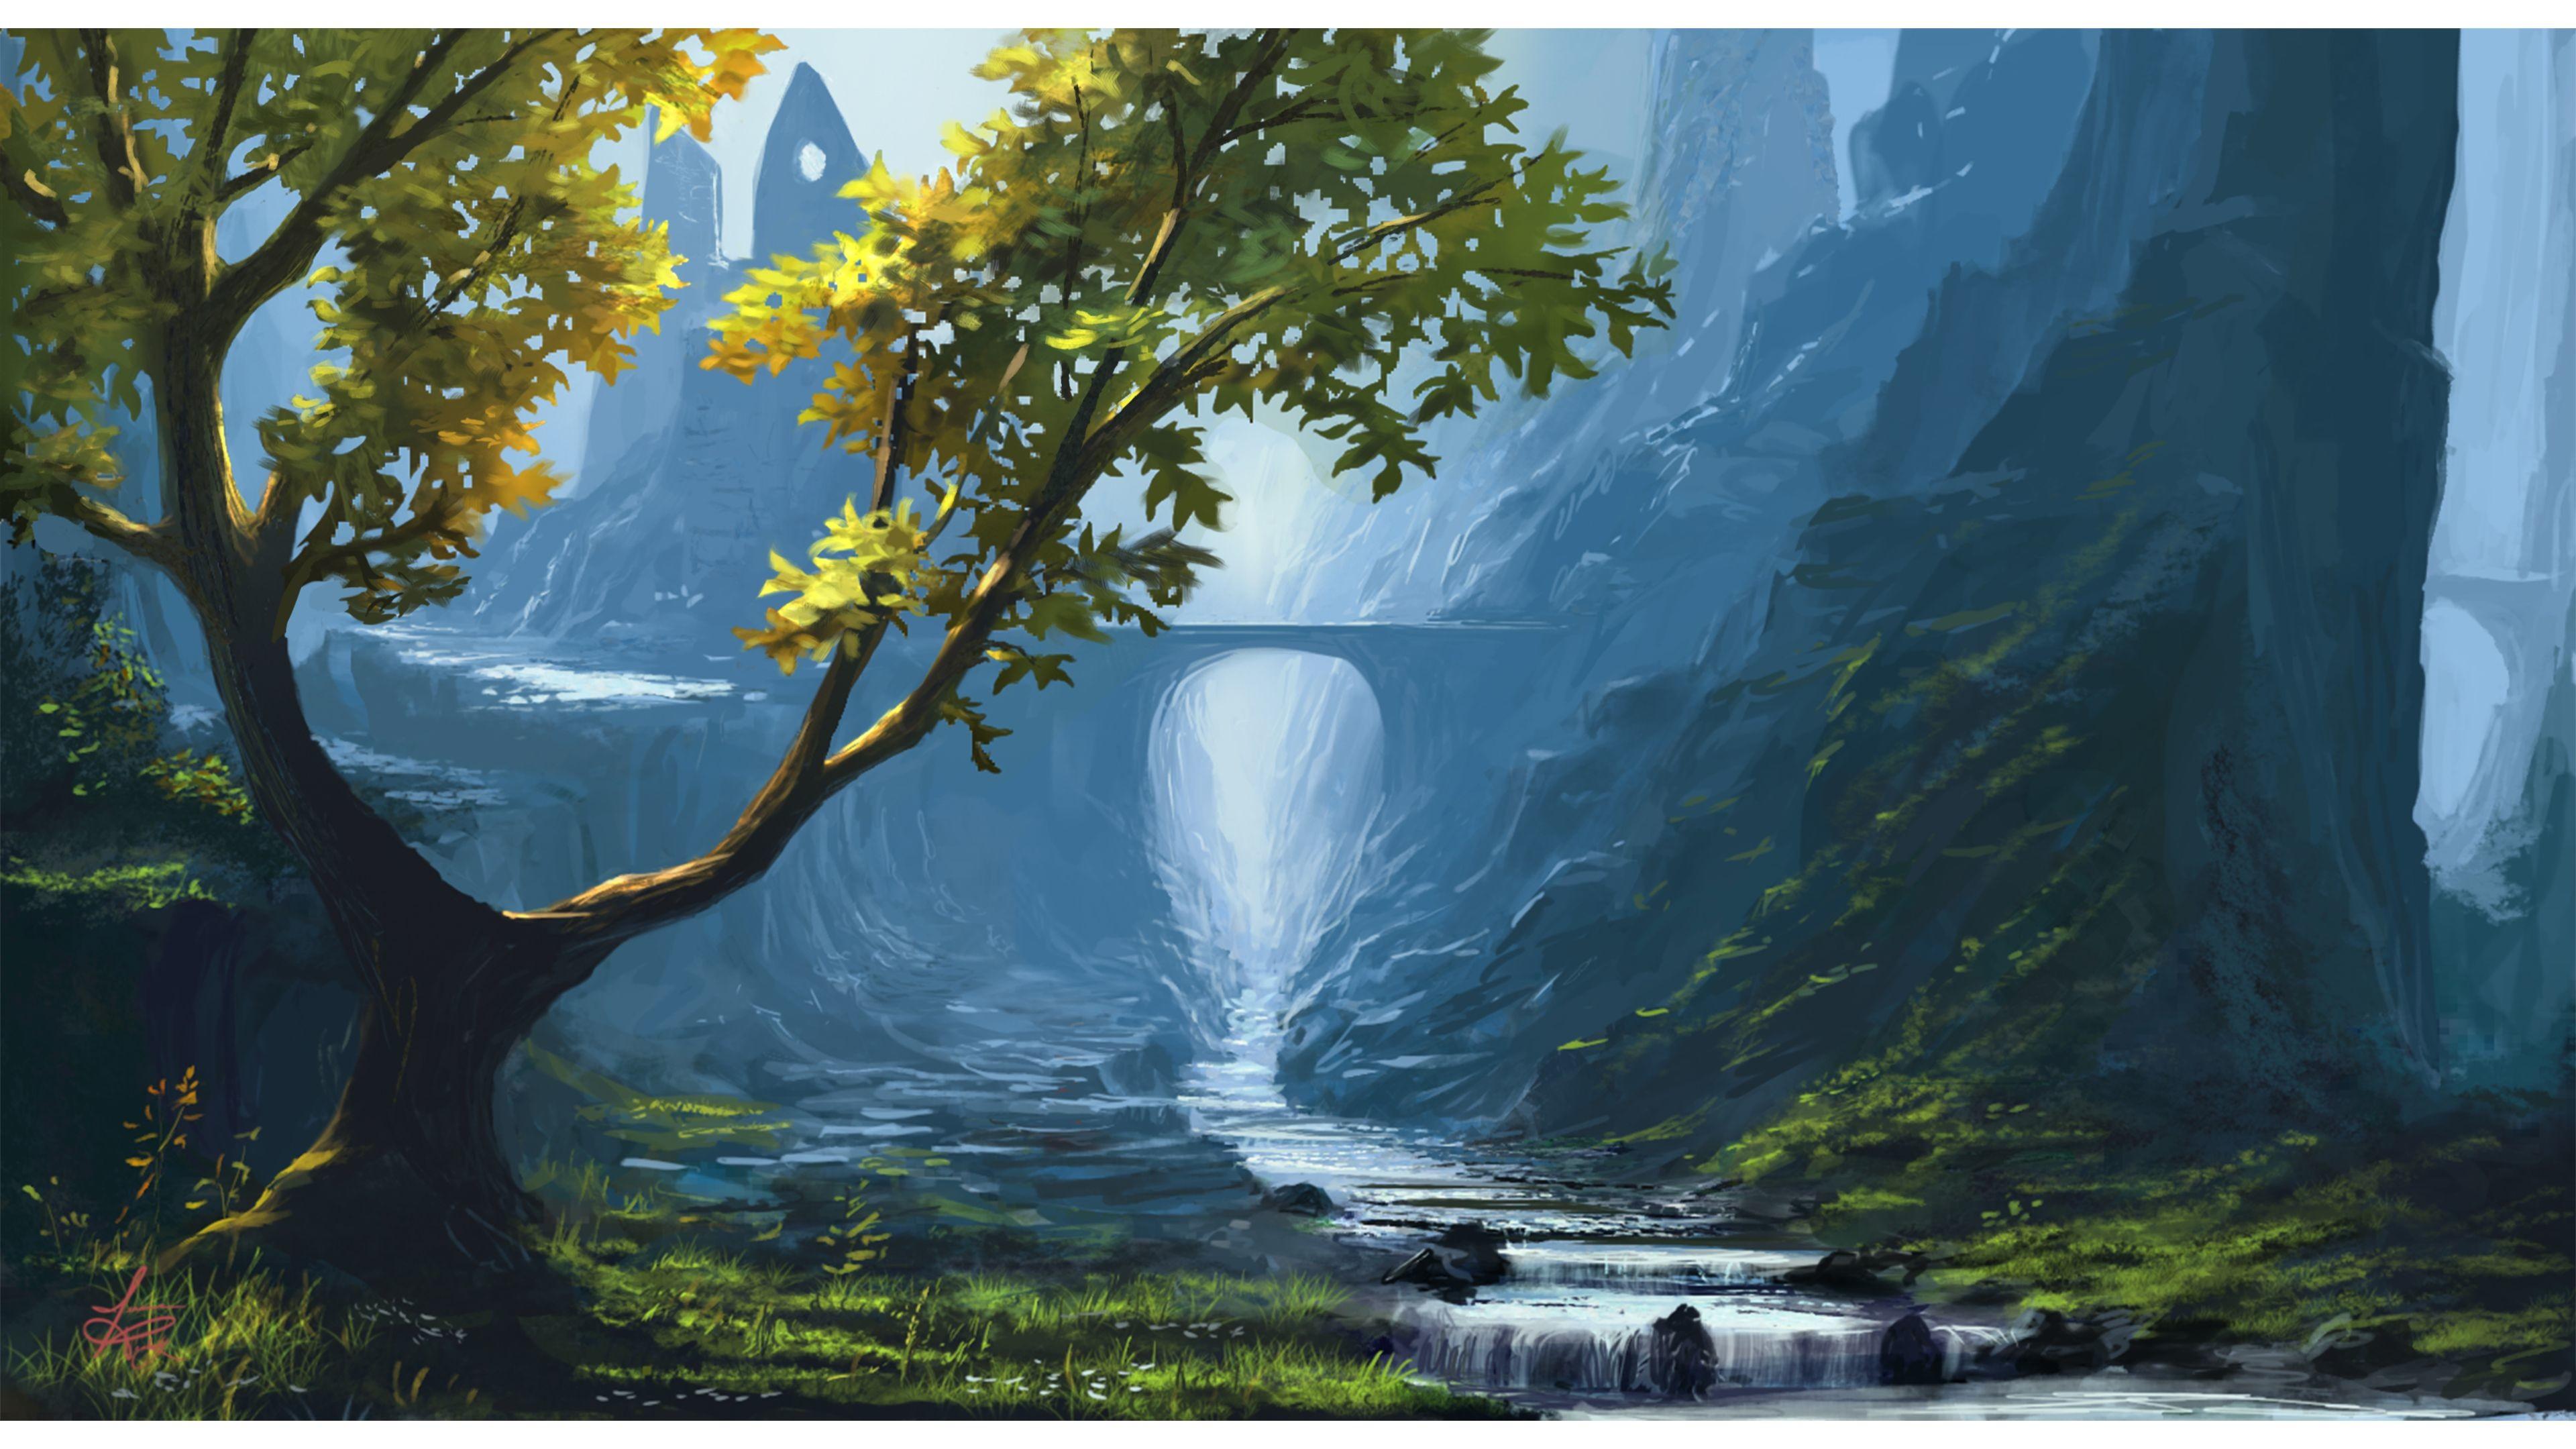 Fantasy nature wallpapers hd 71 images - 1920x1080 wallpaper 4k ...